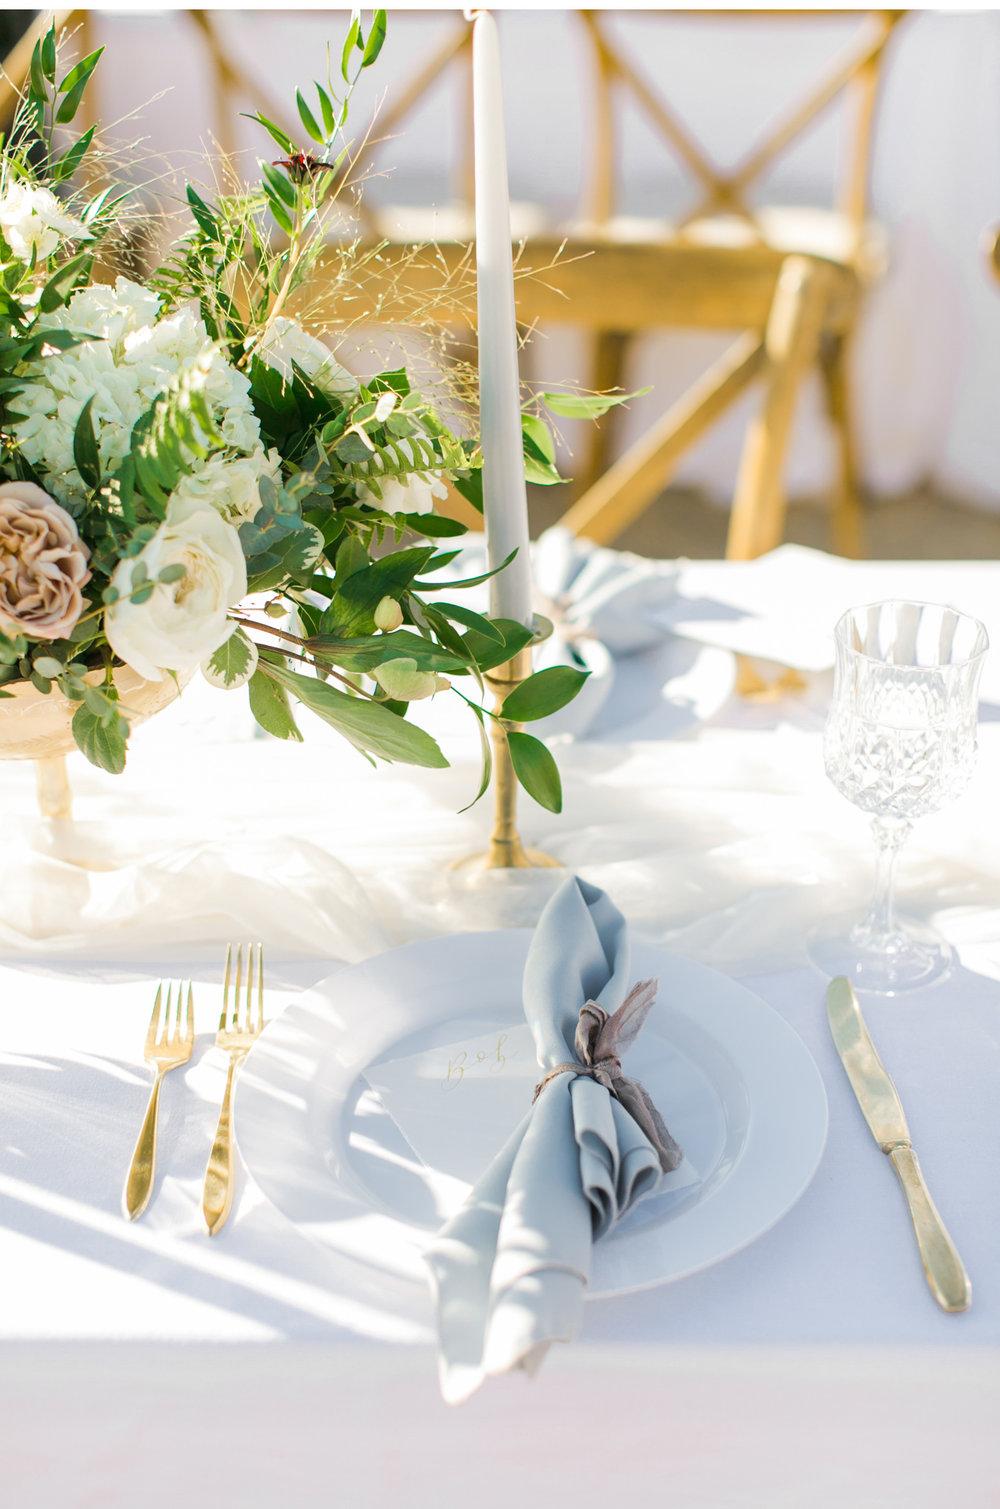 Santa-Ynez-Wedding-Photographer-Sunstone-Winery-Natalie-Schutt-Photography_04.jpg